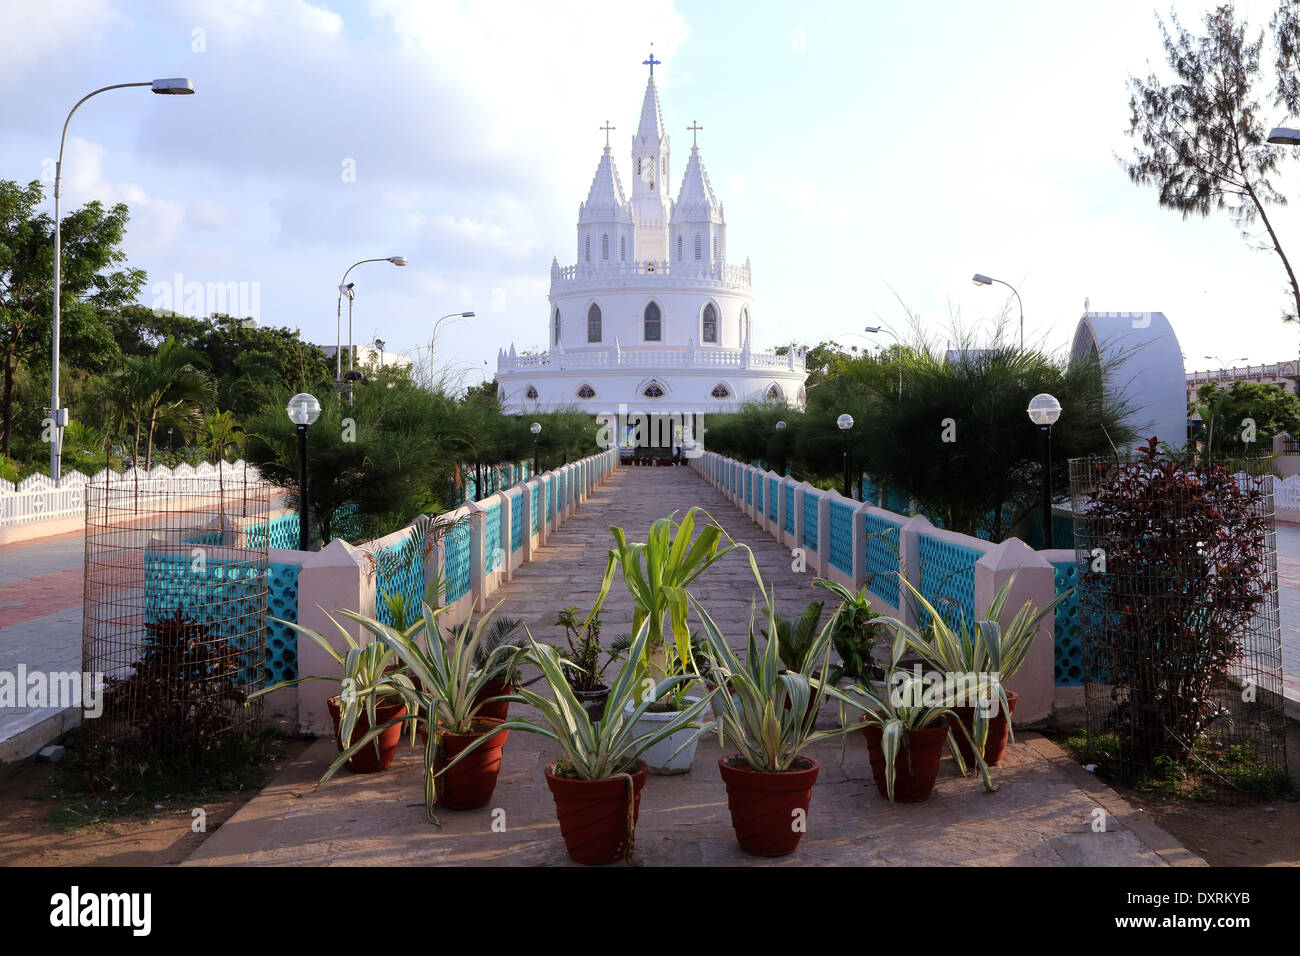 adoration chapel, Vailankanni, Nagapattinam district, Tamil Nadu, India - Stock Image